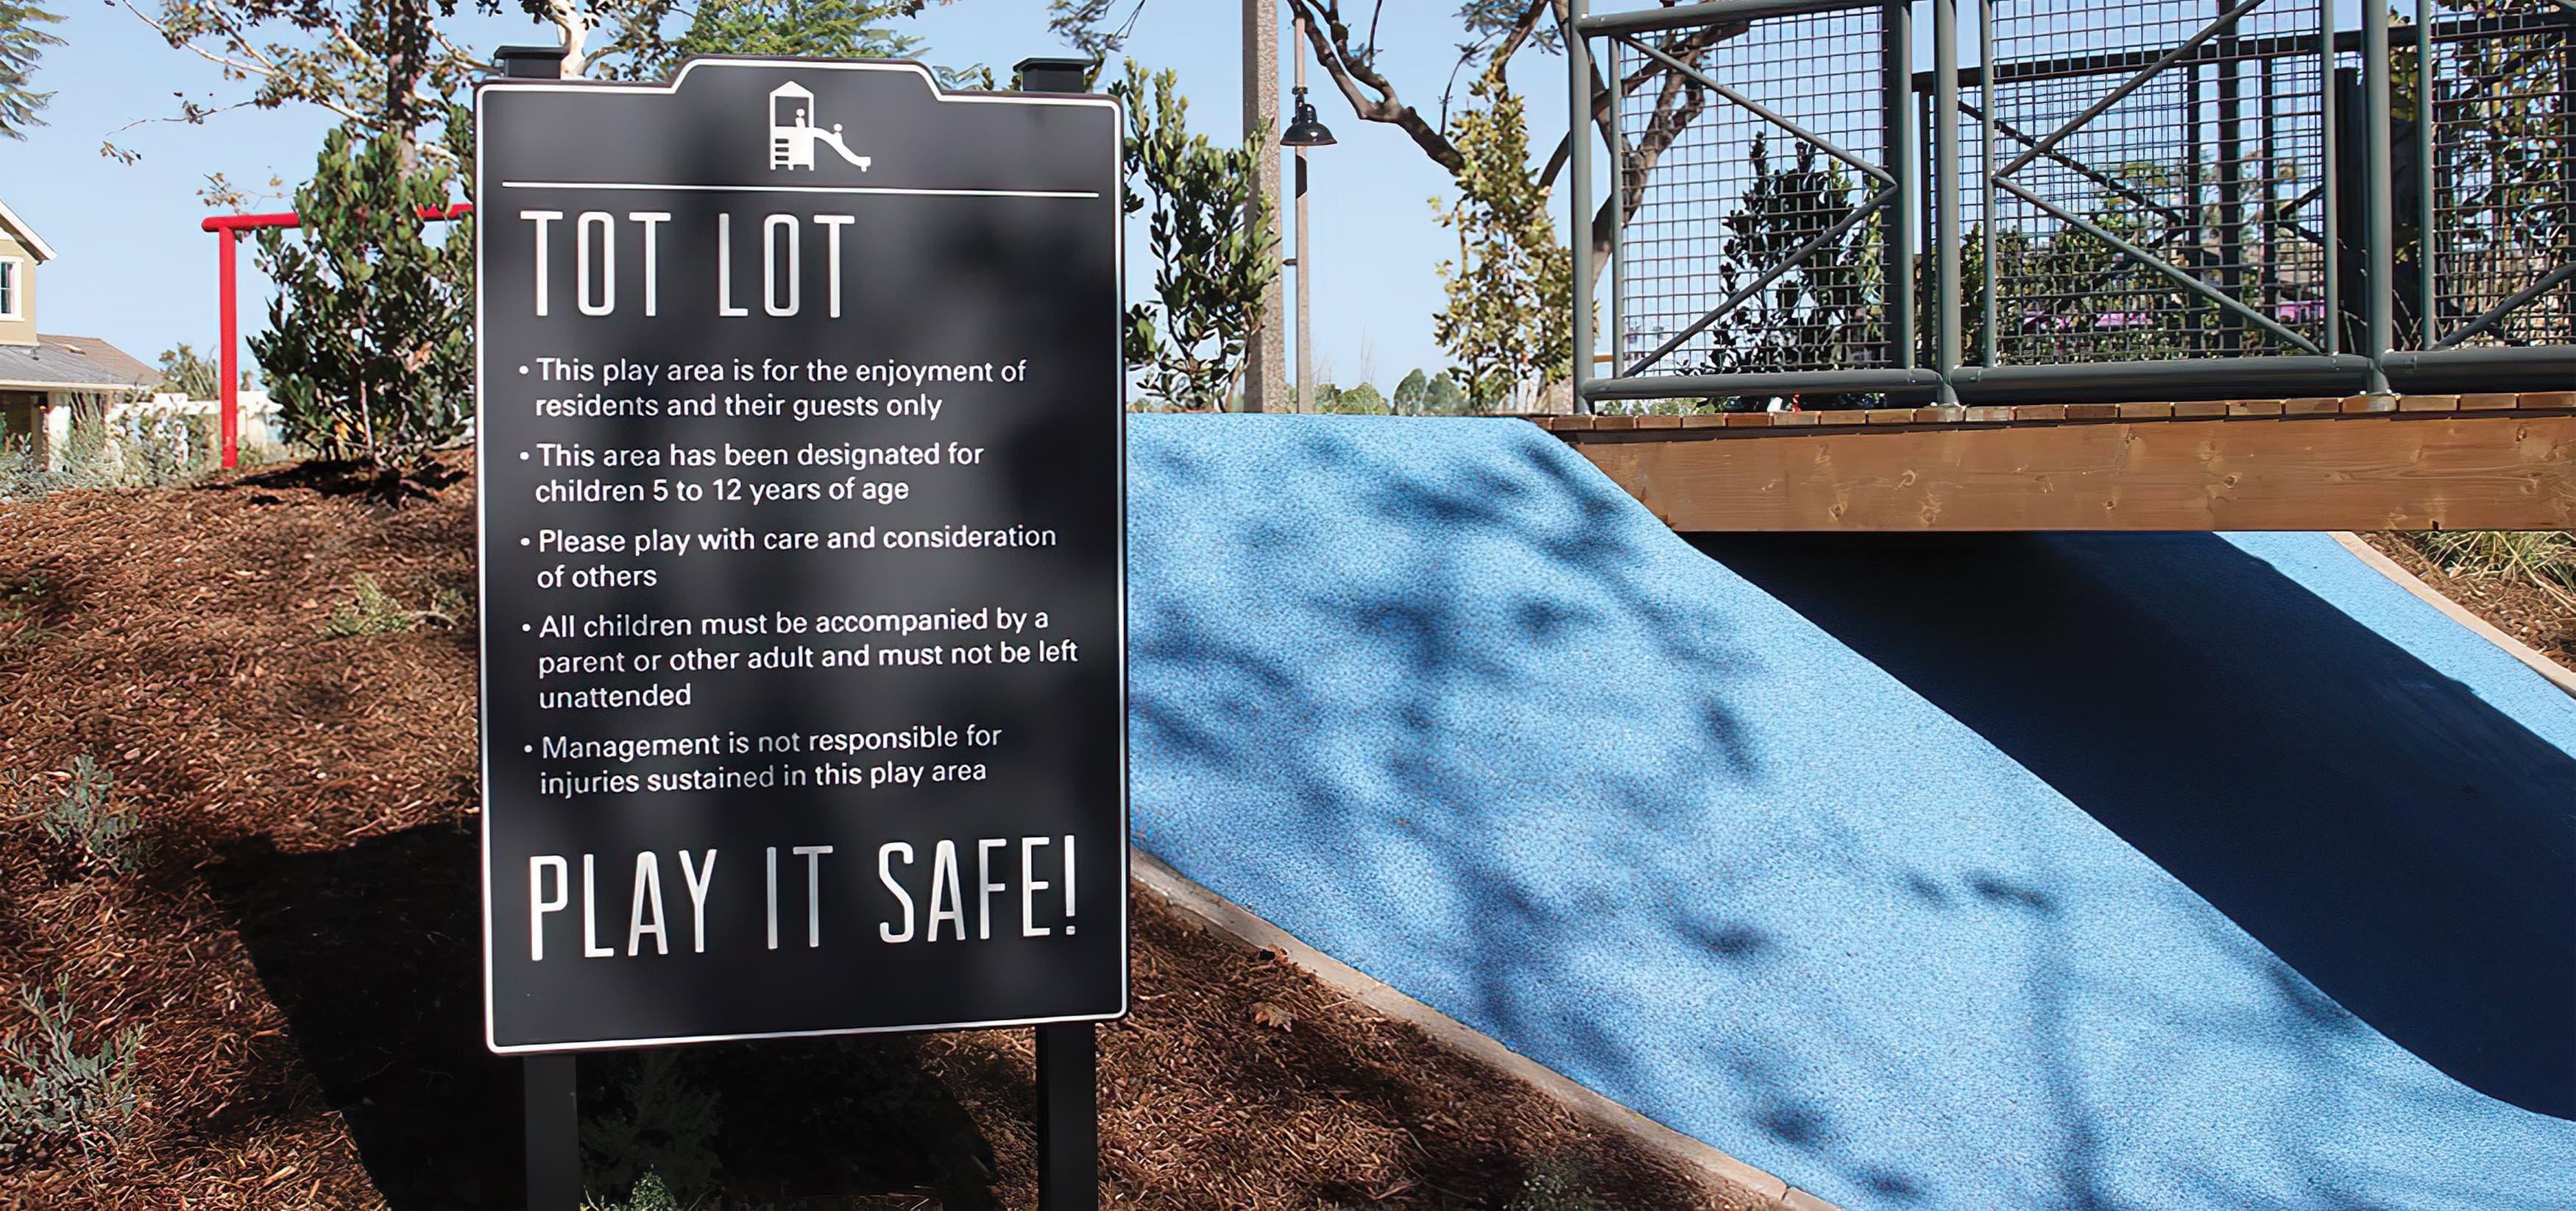 Pavilion Park. Irvine Great Park. Residential Community Park Design. Park Rules Signage.